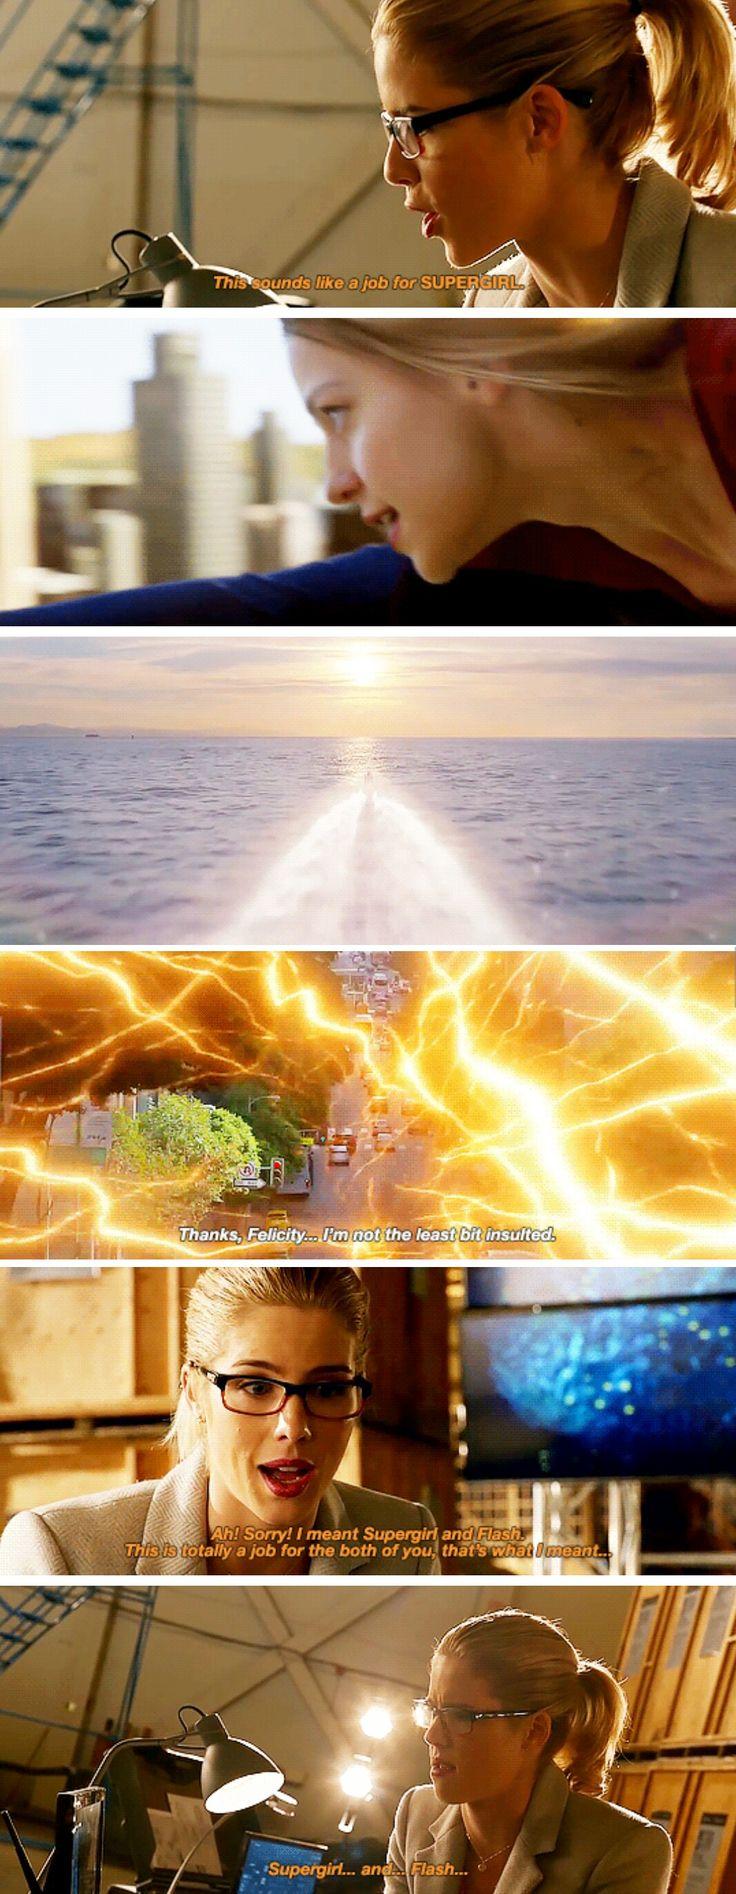 Felicity Smoak in #LegendsofTomorrow #Season2 #2x07 - Crossover Part 3!